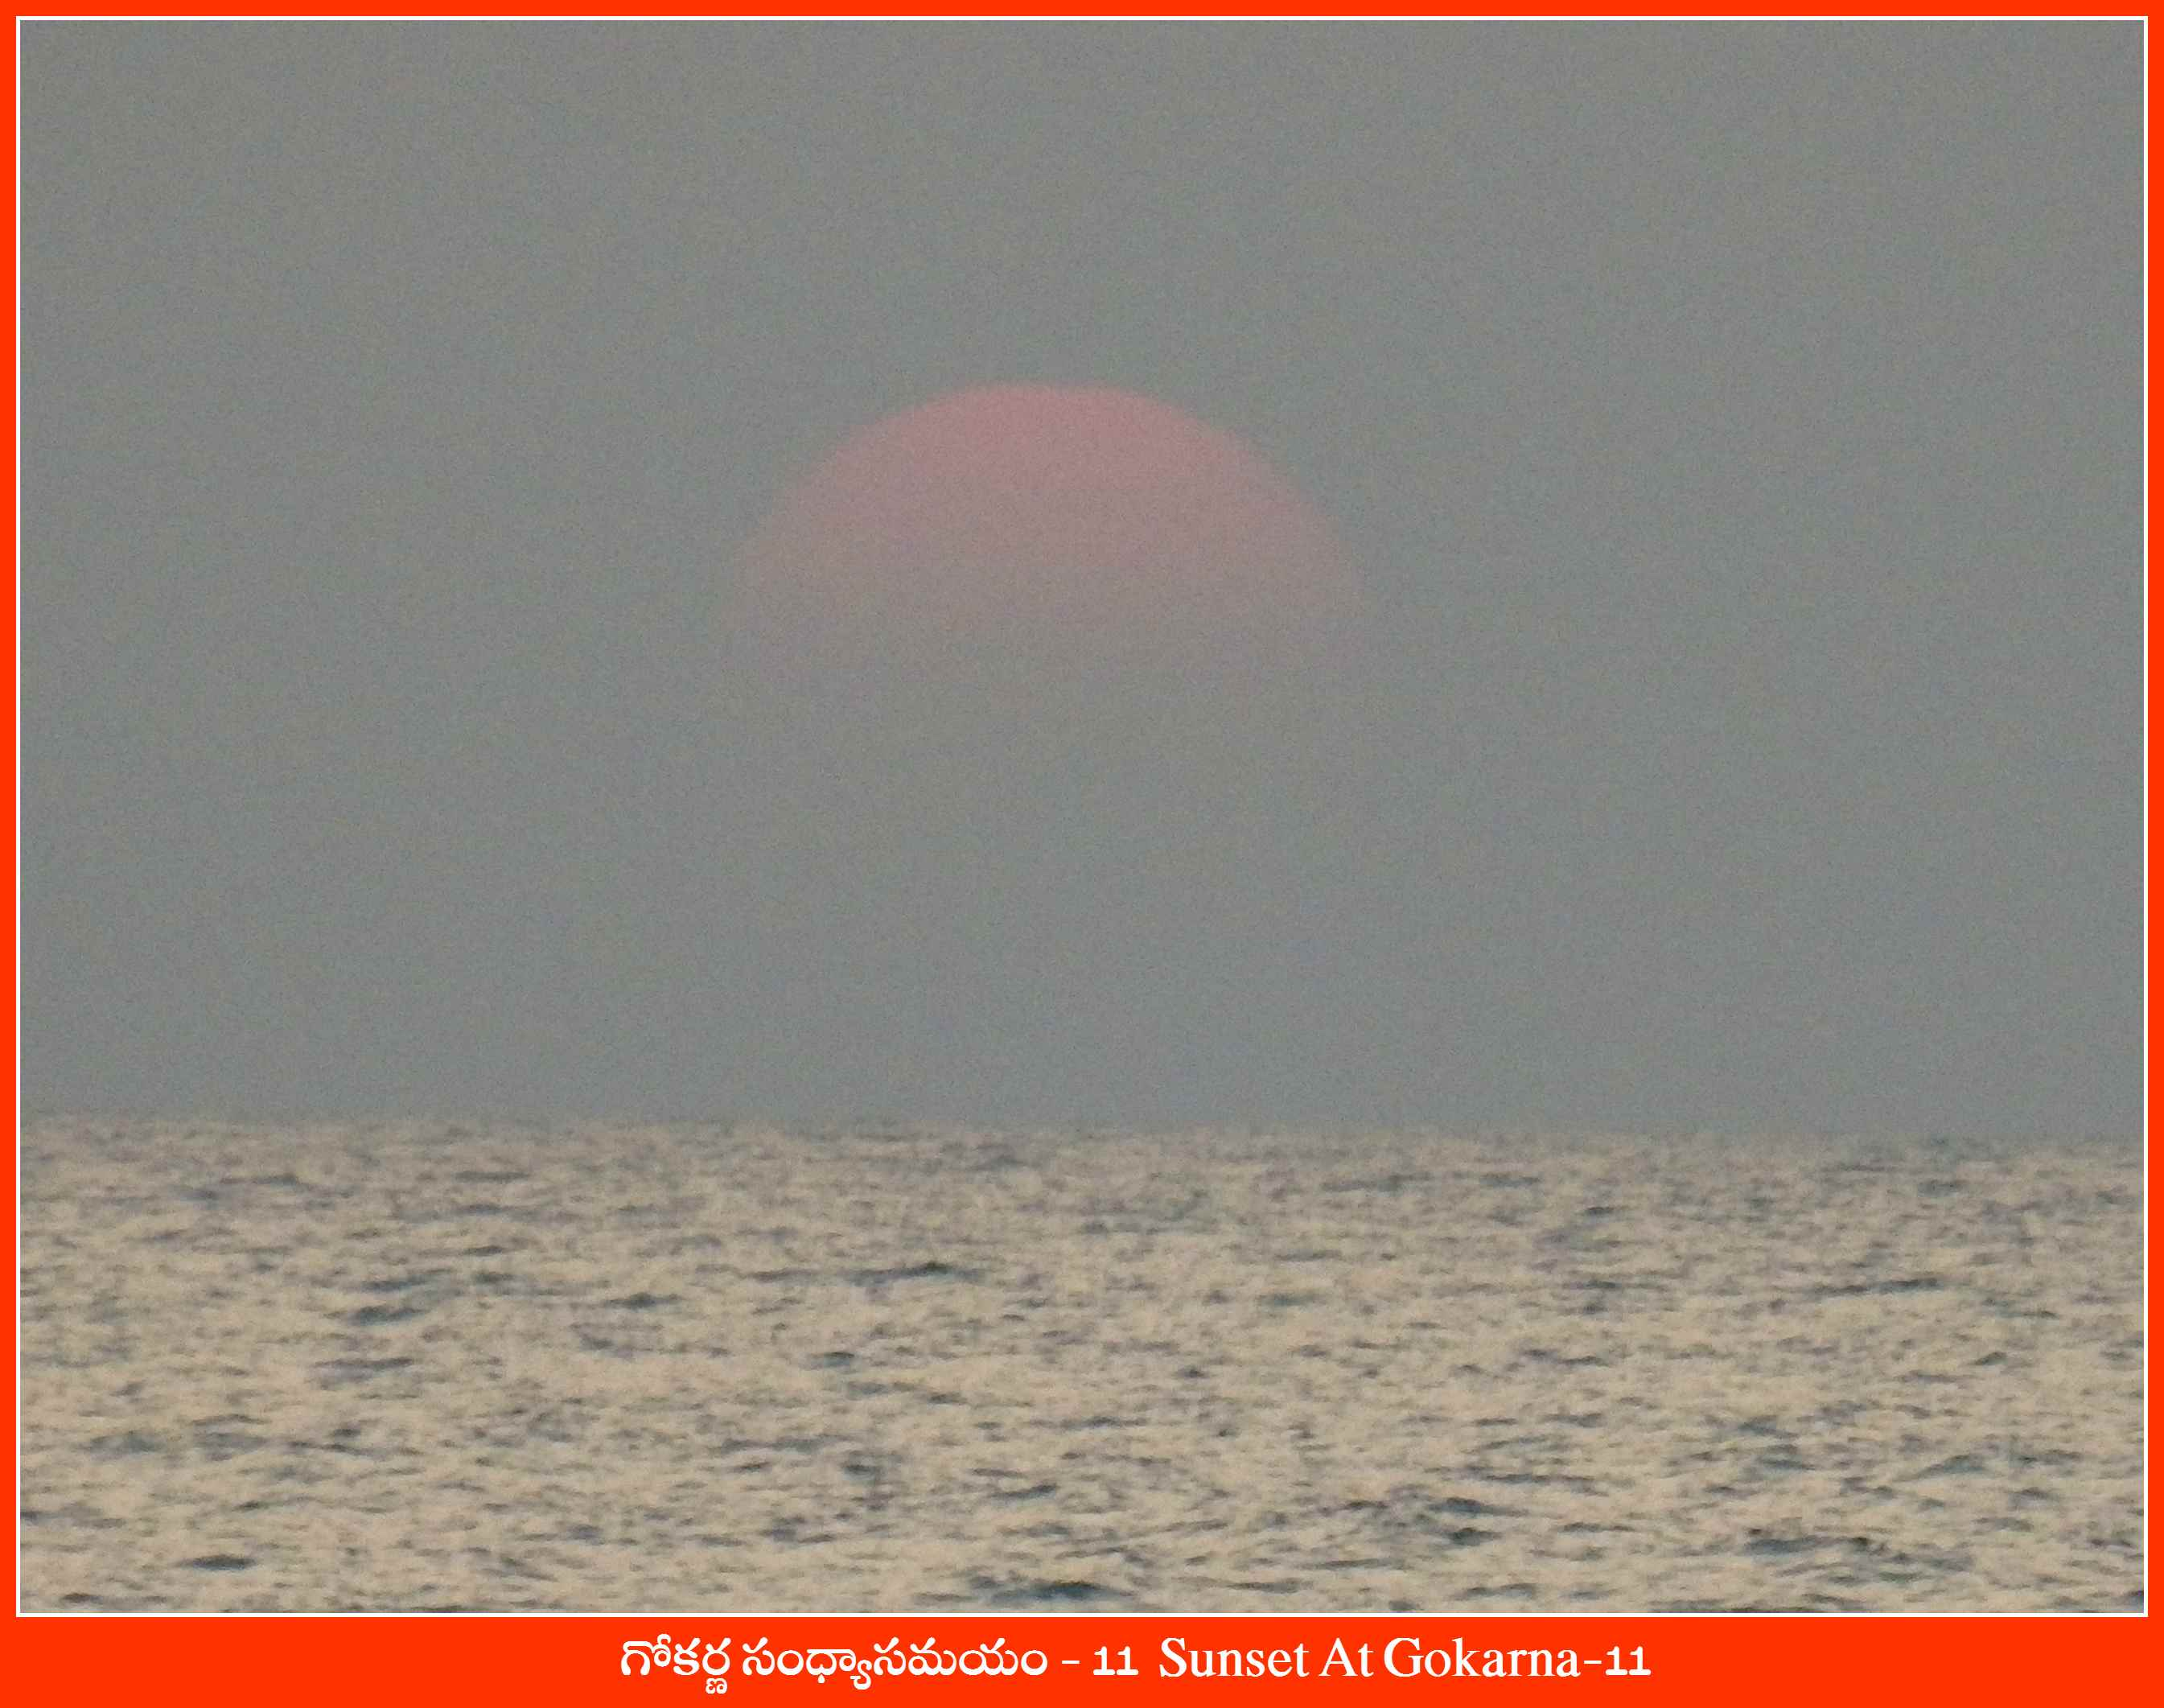 Sunset At Gokarna-11